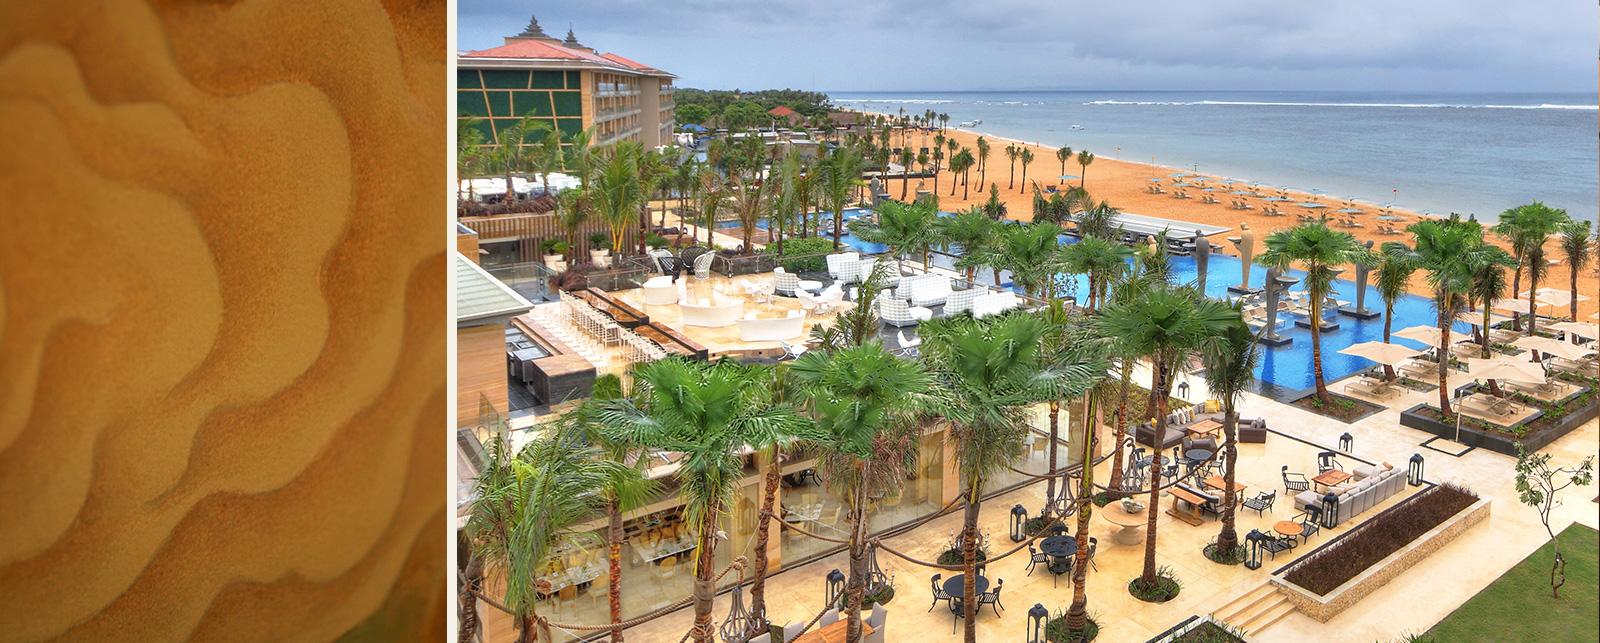 luxury resort in nusa dua the mulia nusa dua bali rh themulia com villa termahal di jimbaran bali Permainan Di Villa